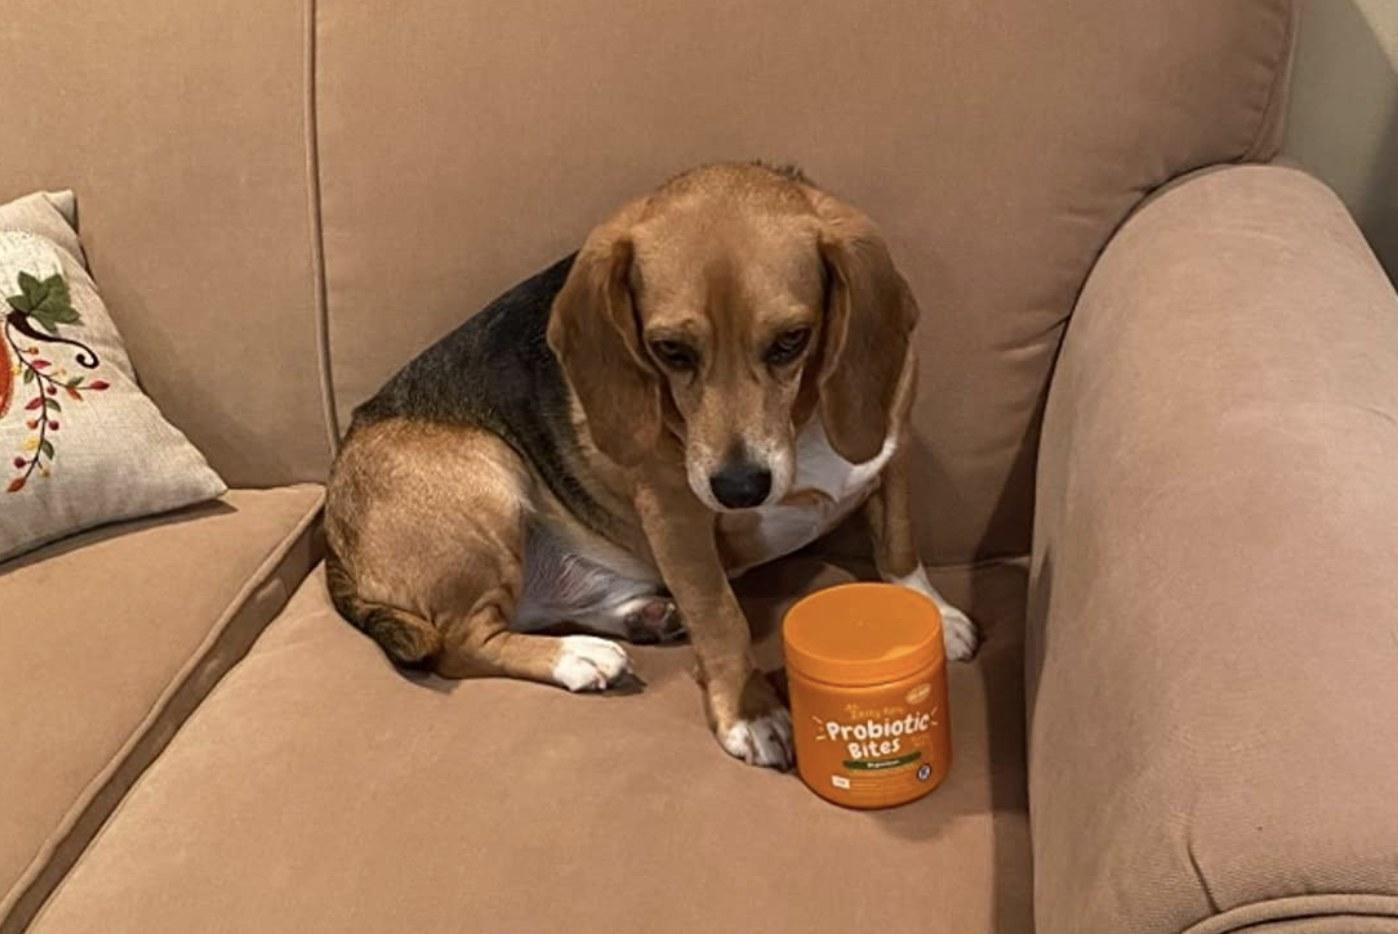 a dog sitting next to the jar of probiotics